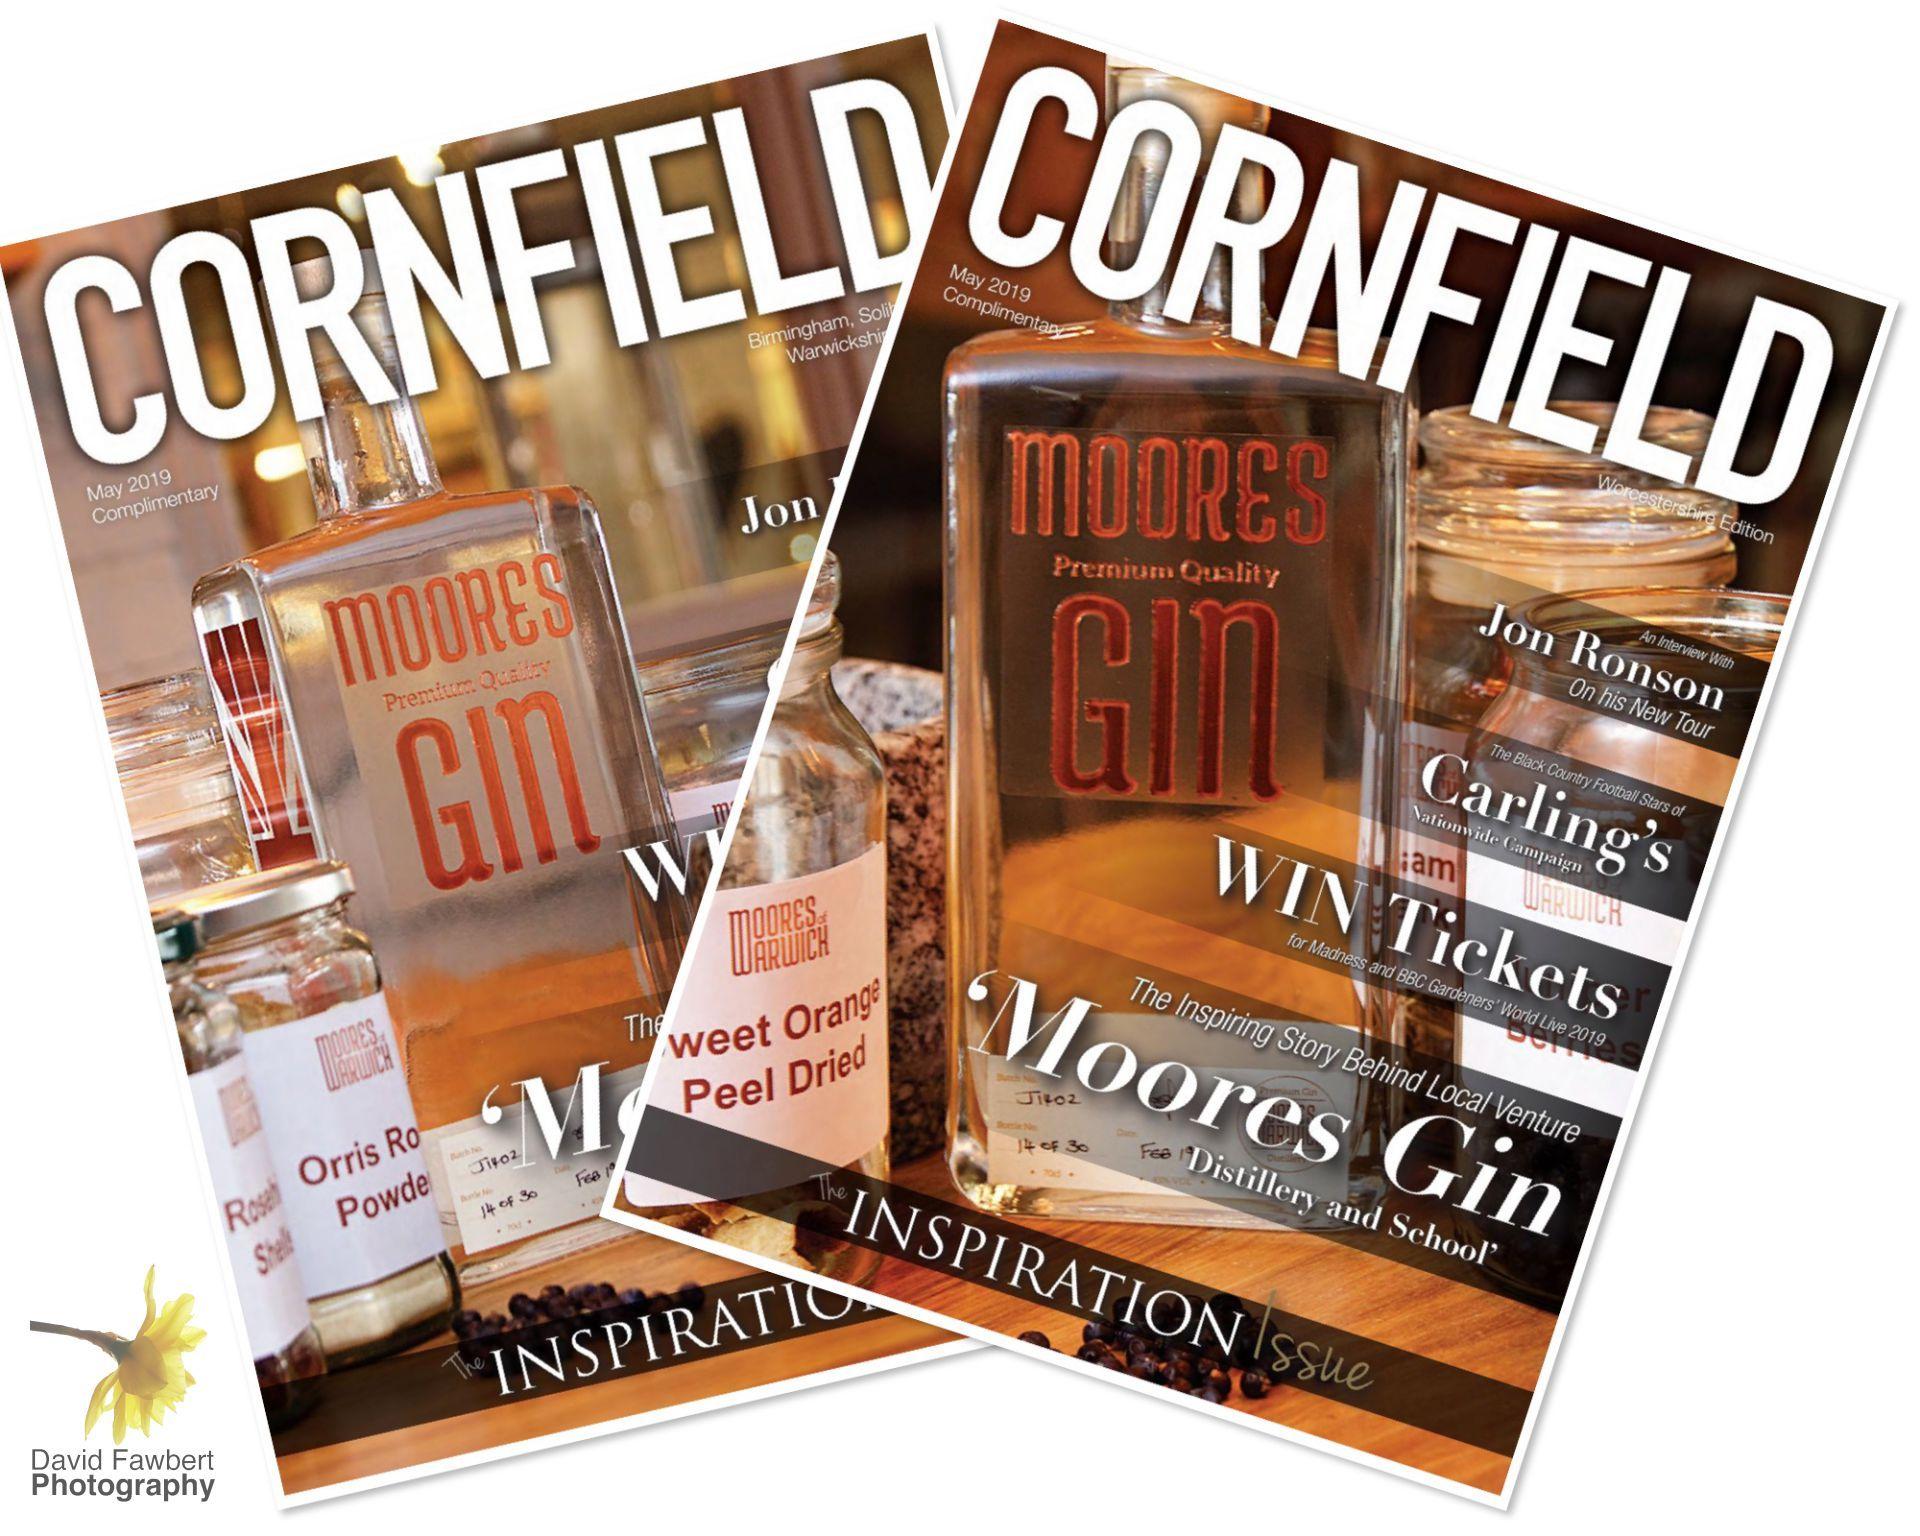 Cornfield Magazine